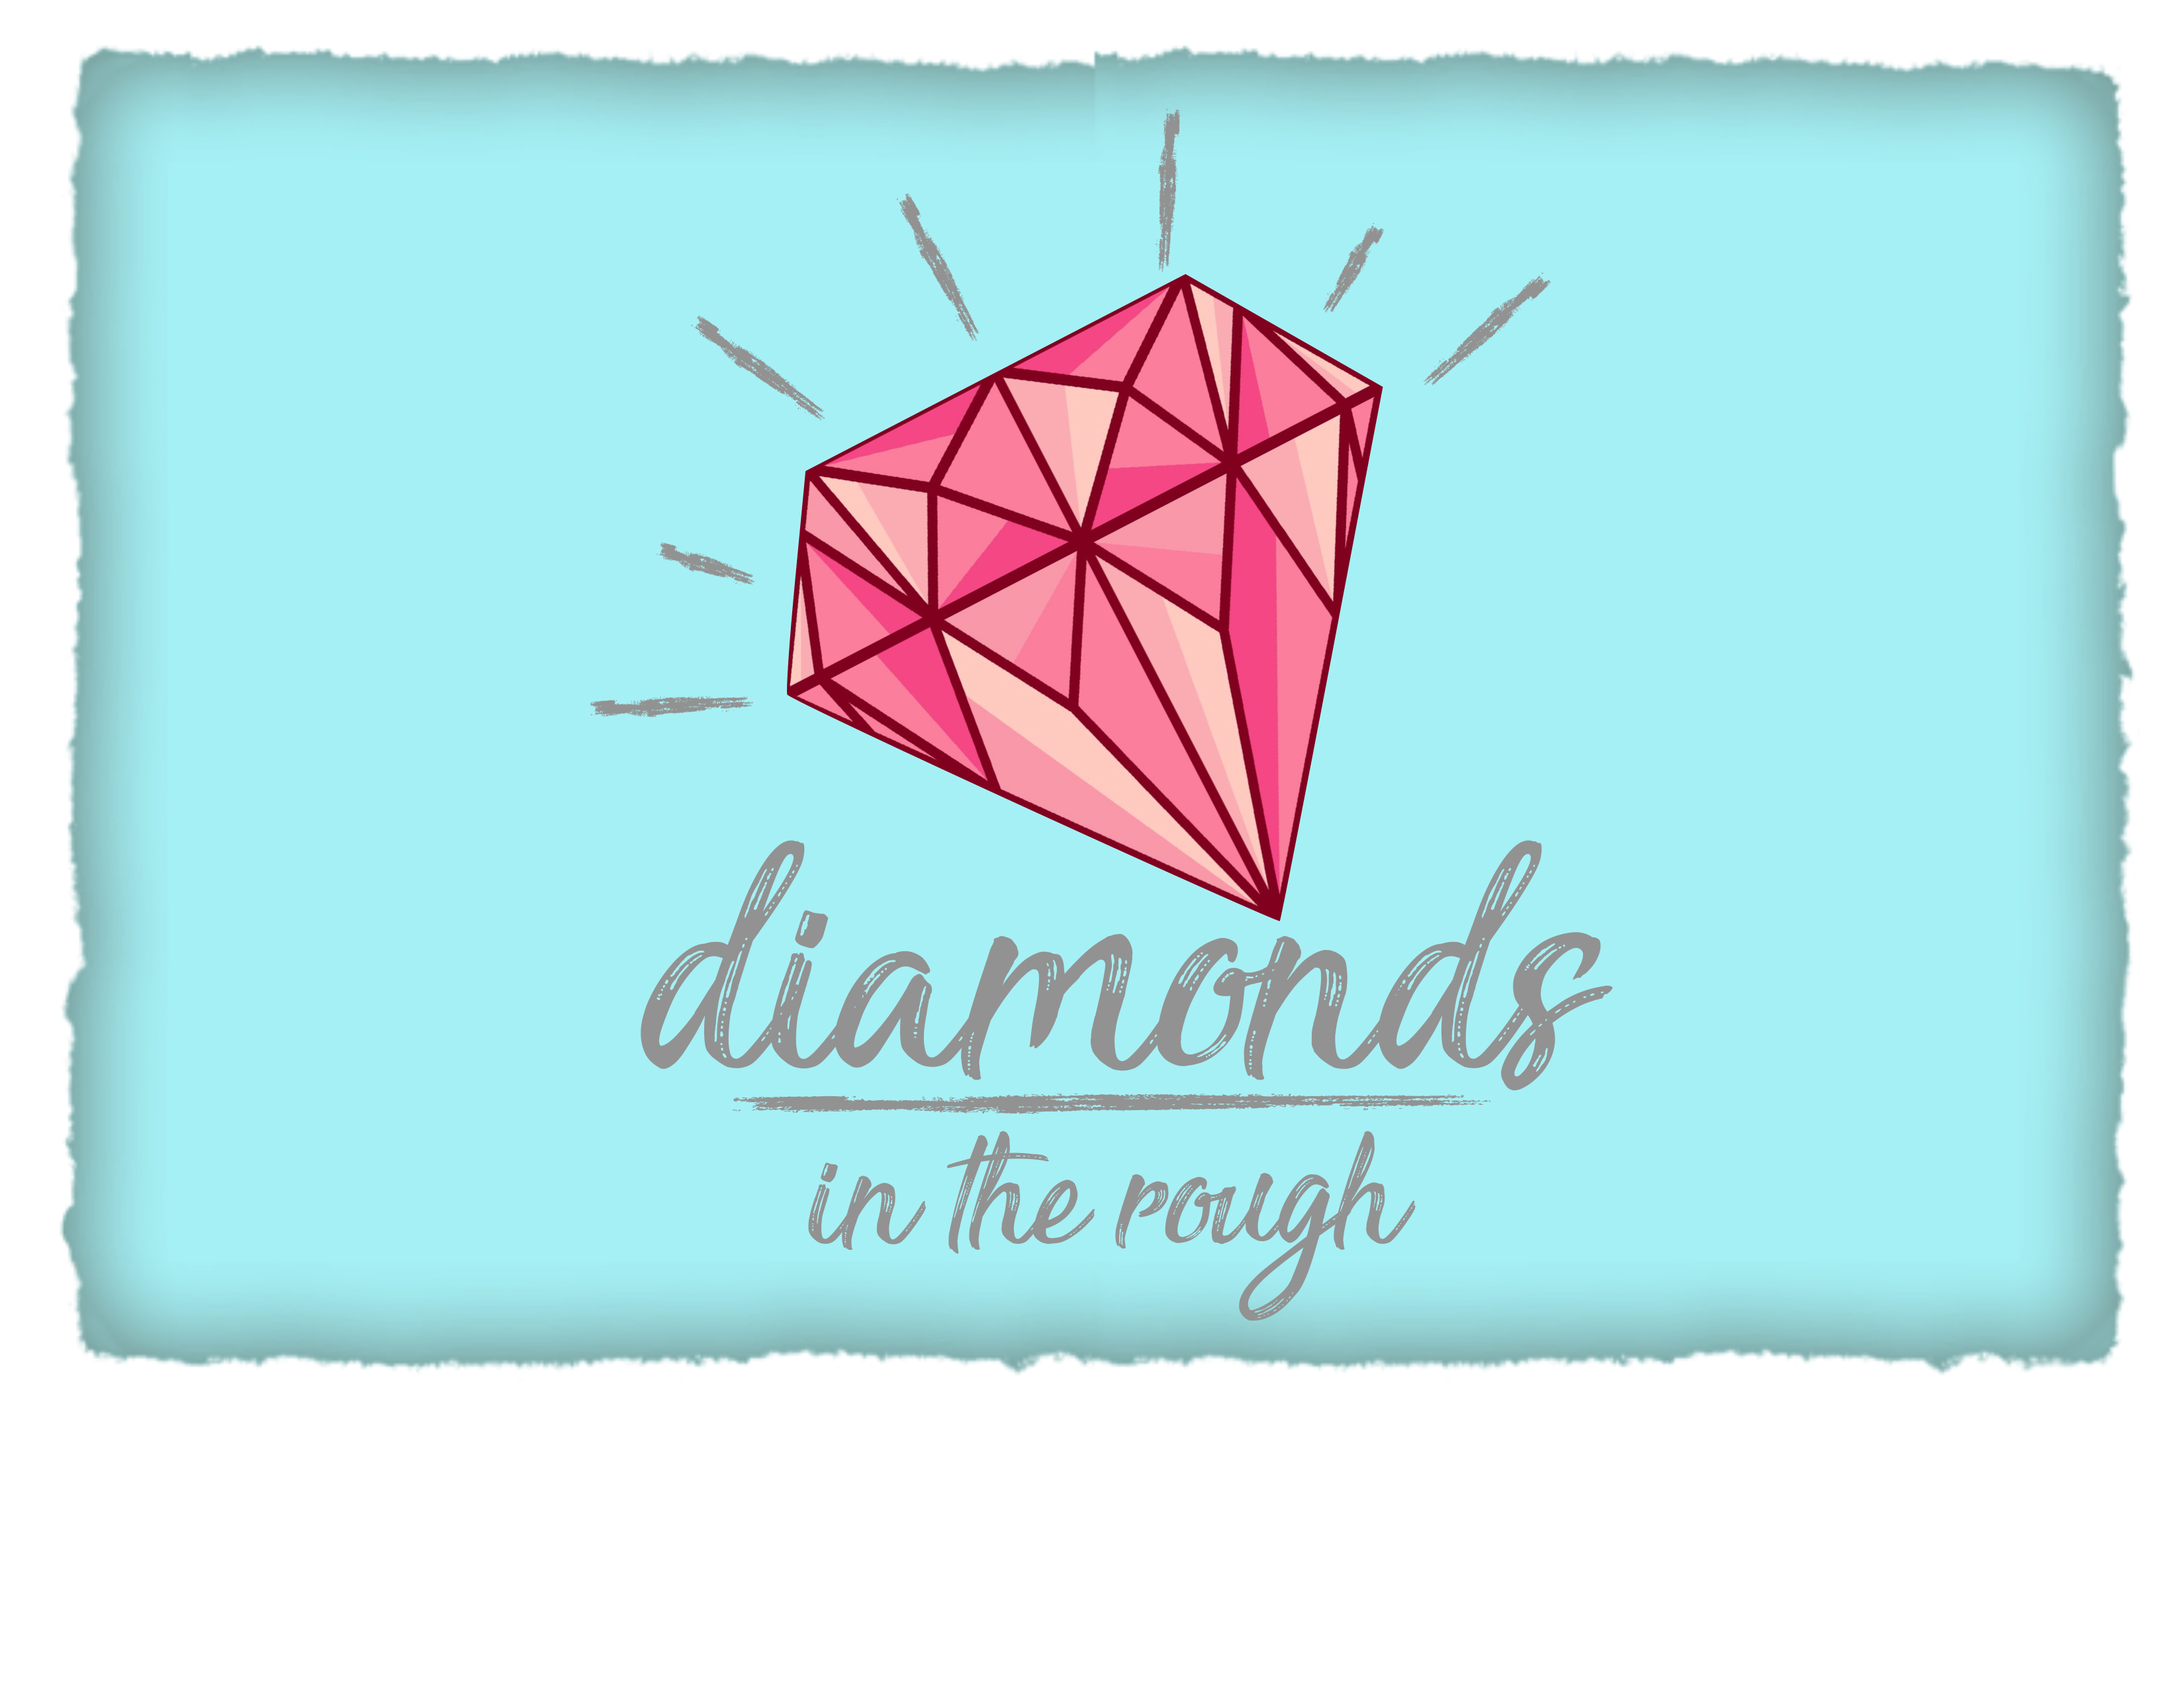 Diamond in the rough graphic